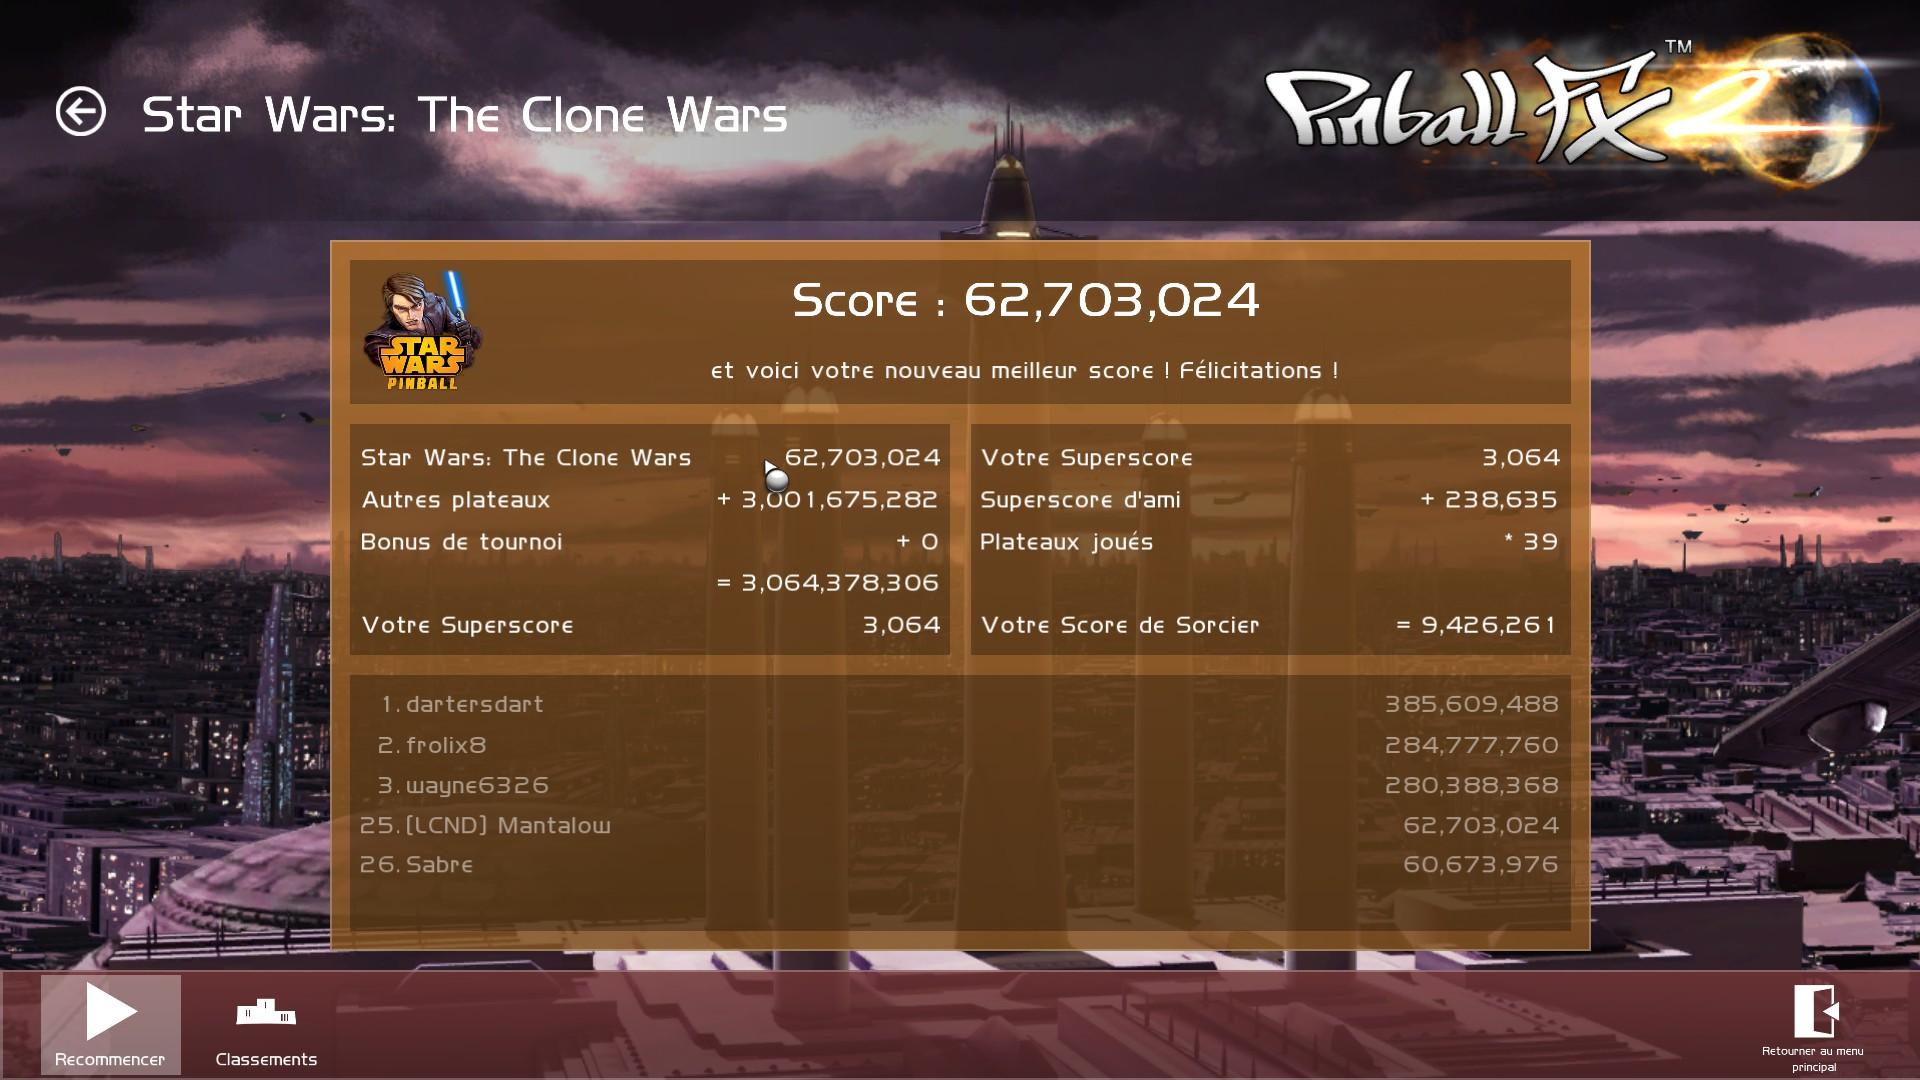 Mantalow: Pinball FX 2: Star Wars: The Clone Wars (PC) 62,703,024 points on 2015-03-05 10:04:19